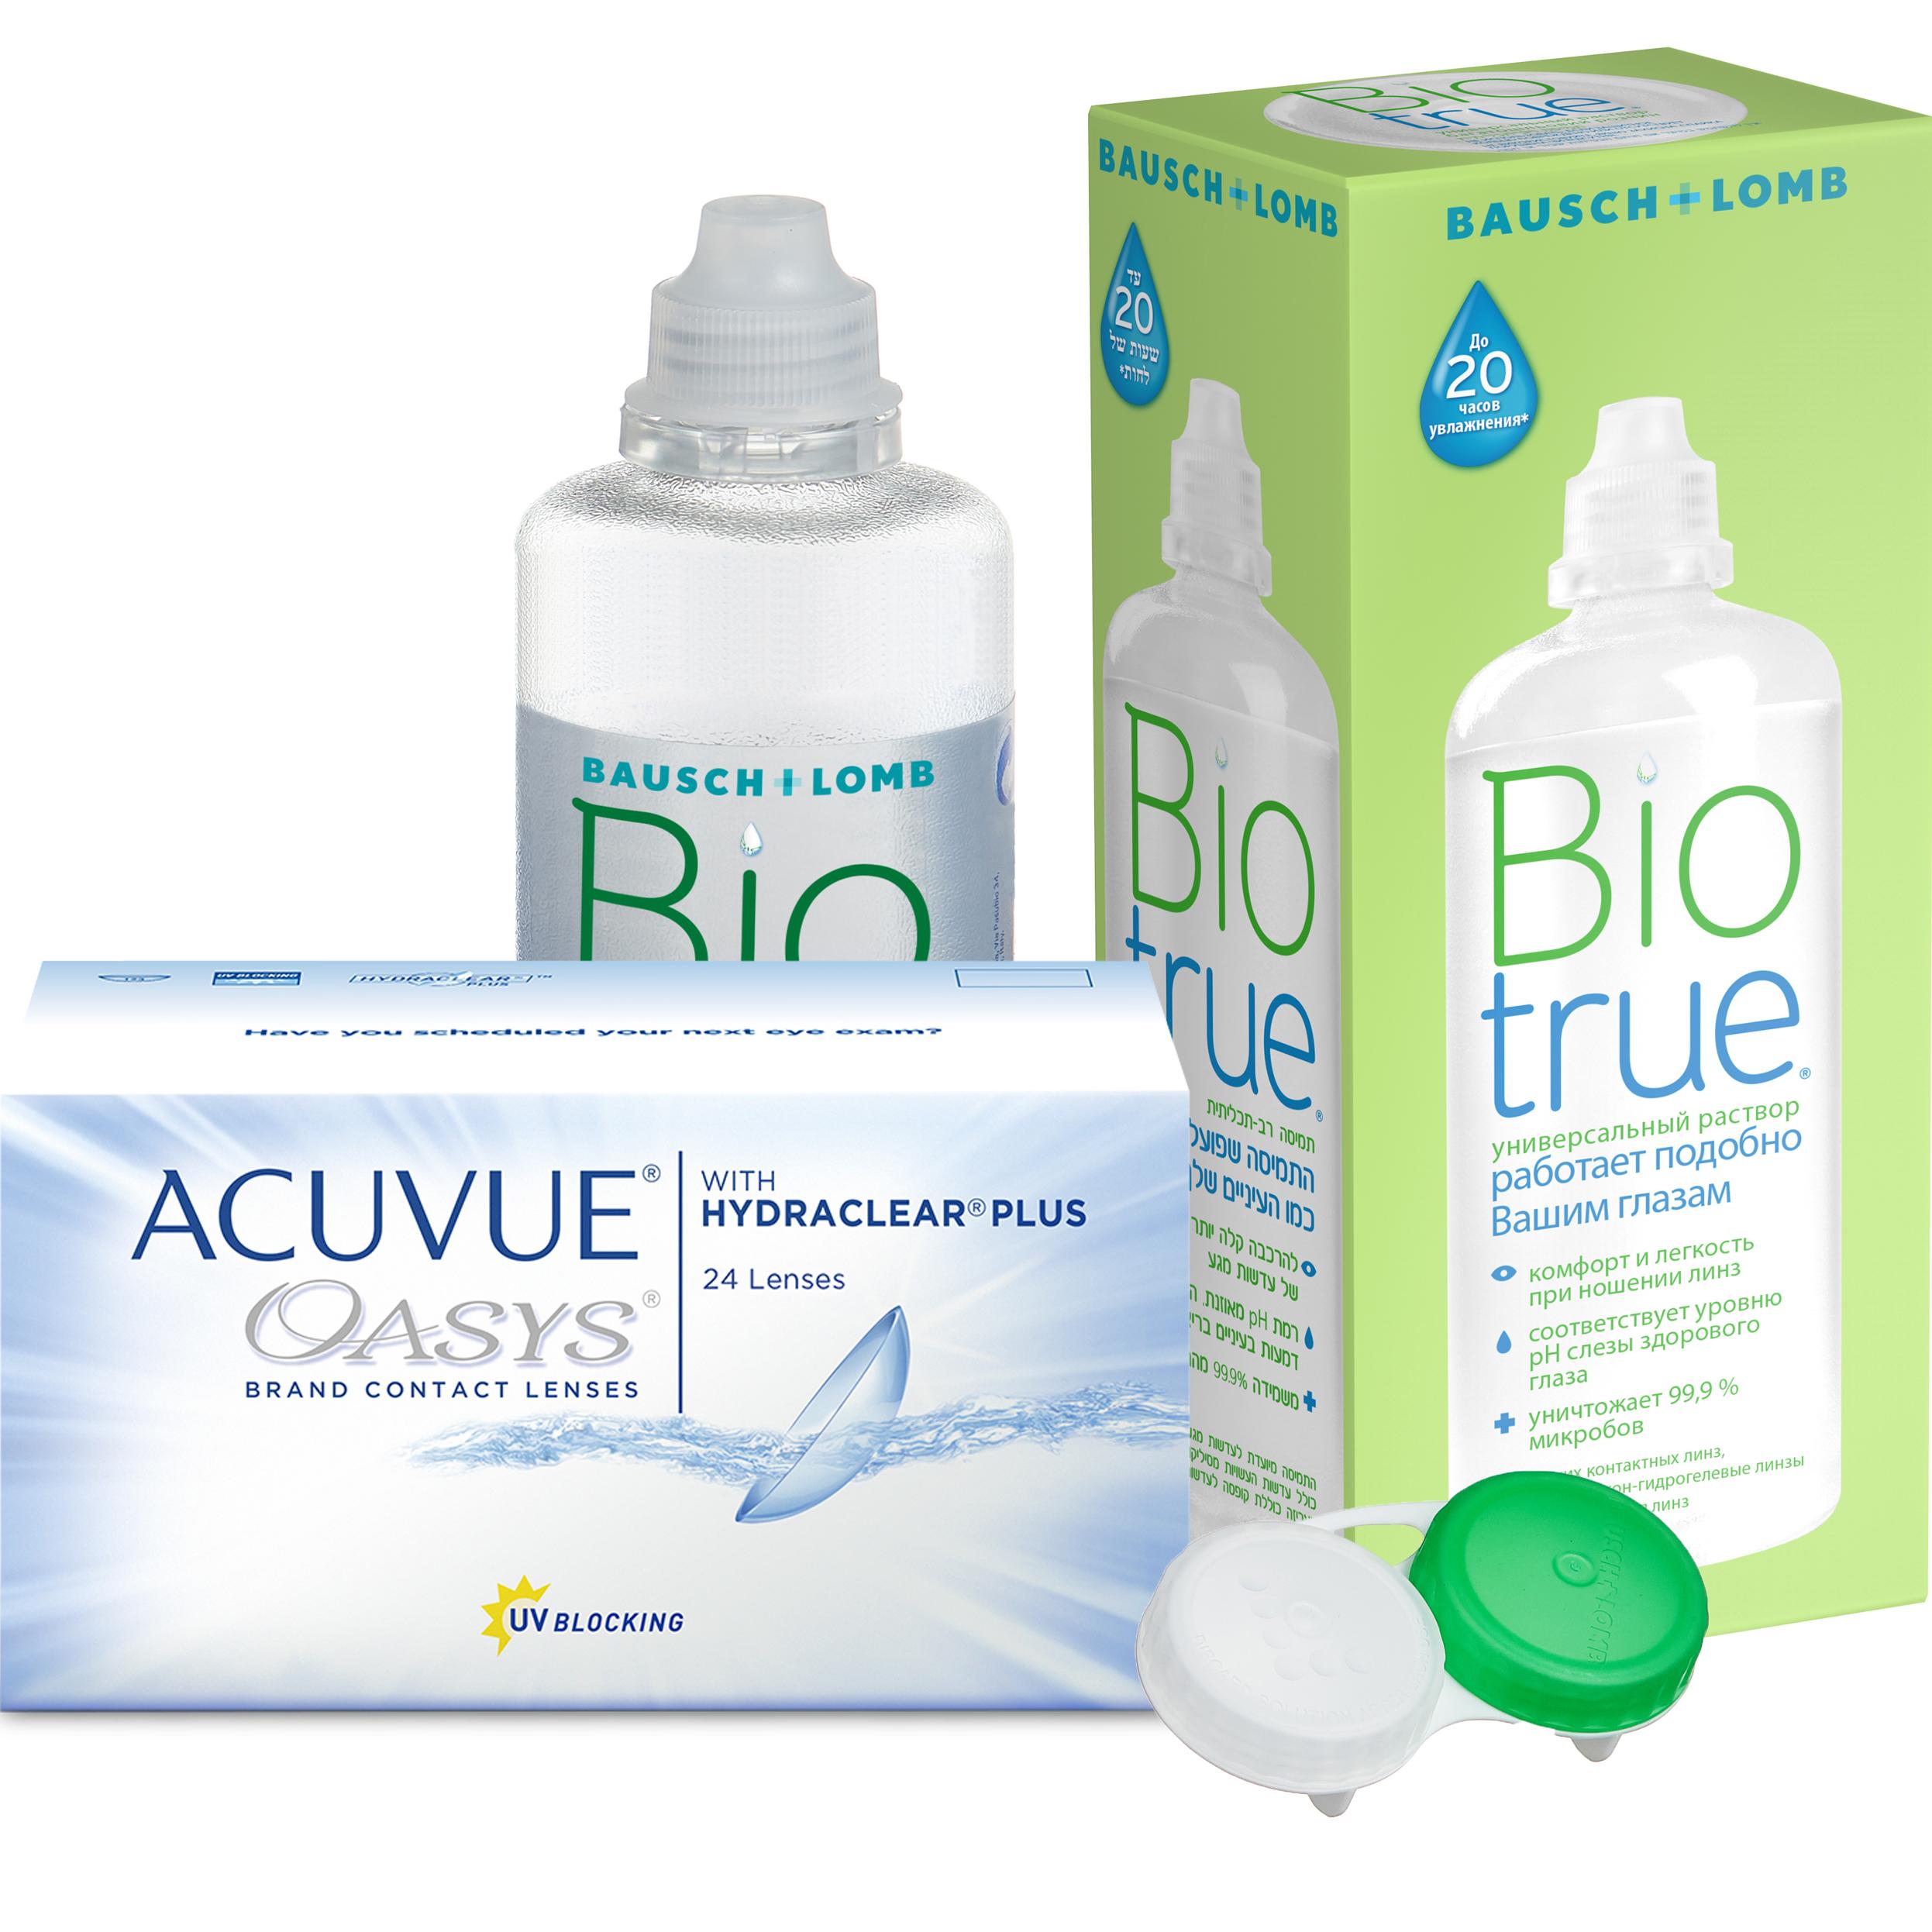 Купить Oasys with Hydraclear Plus 24 линзы + Biotrue, Контактные линзы Acuvue Oasys with Hydraclear Plus 24 линзы R 8.4 -3, 50 + Biotrue 300 мл